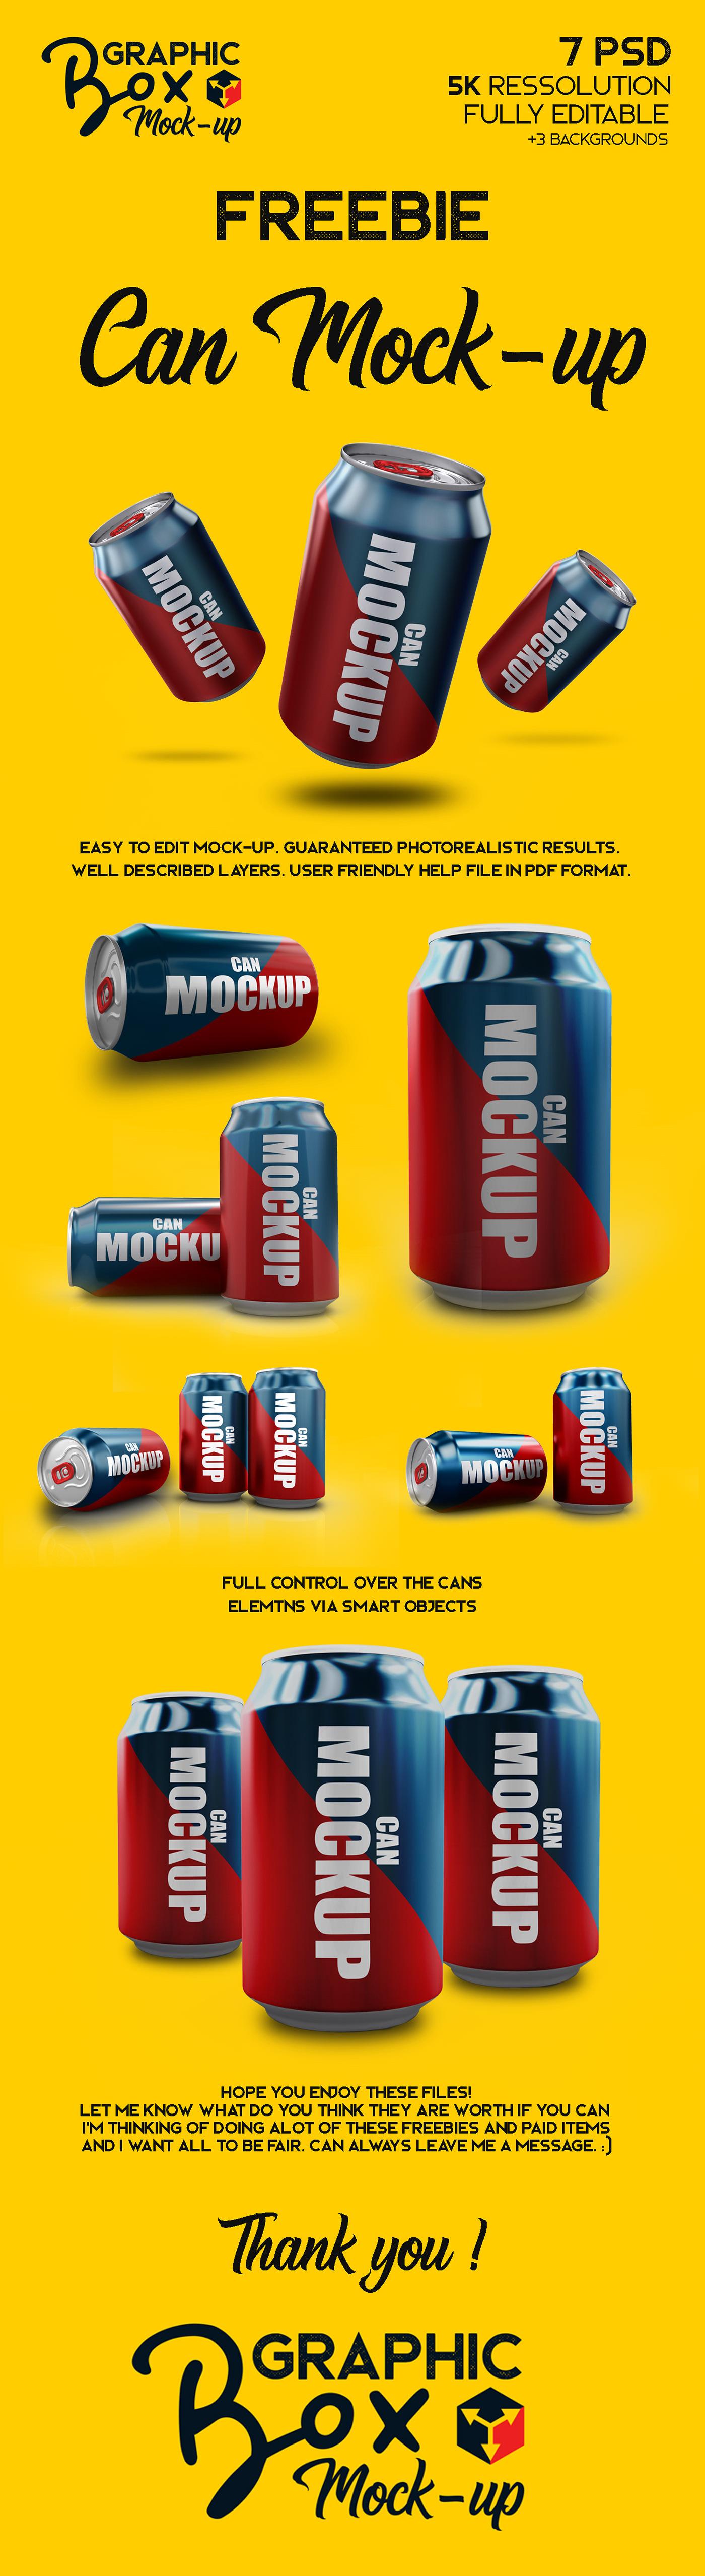 Мокап алюминиевых банок. soda cans mockup